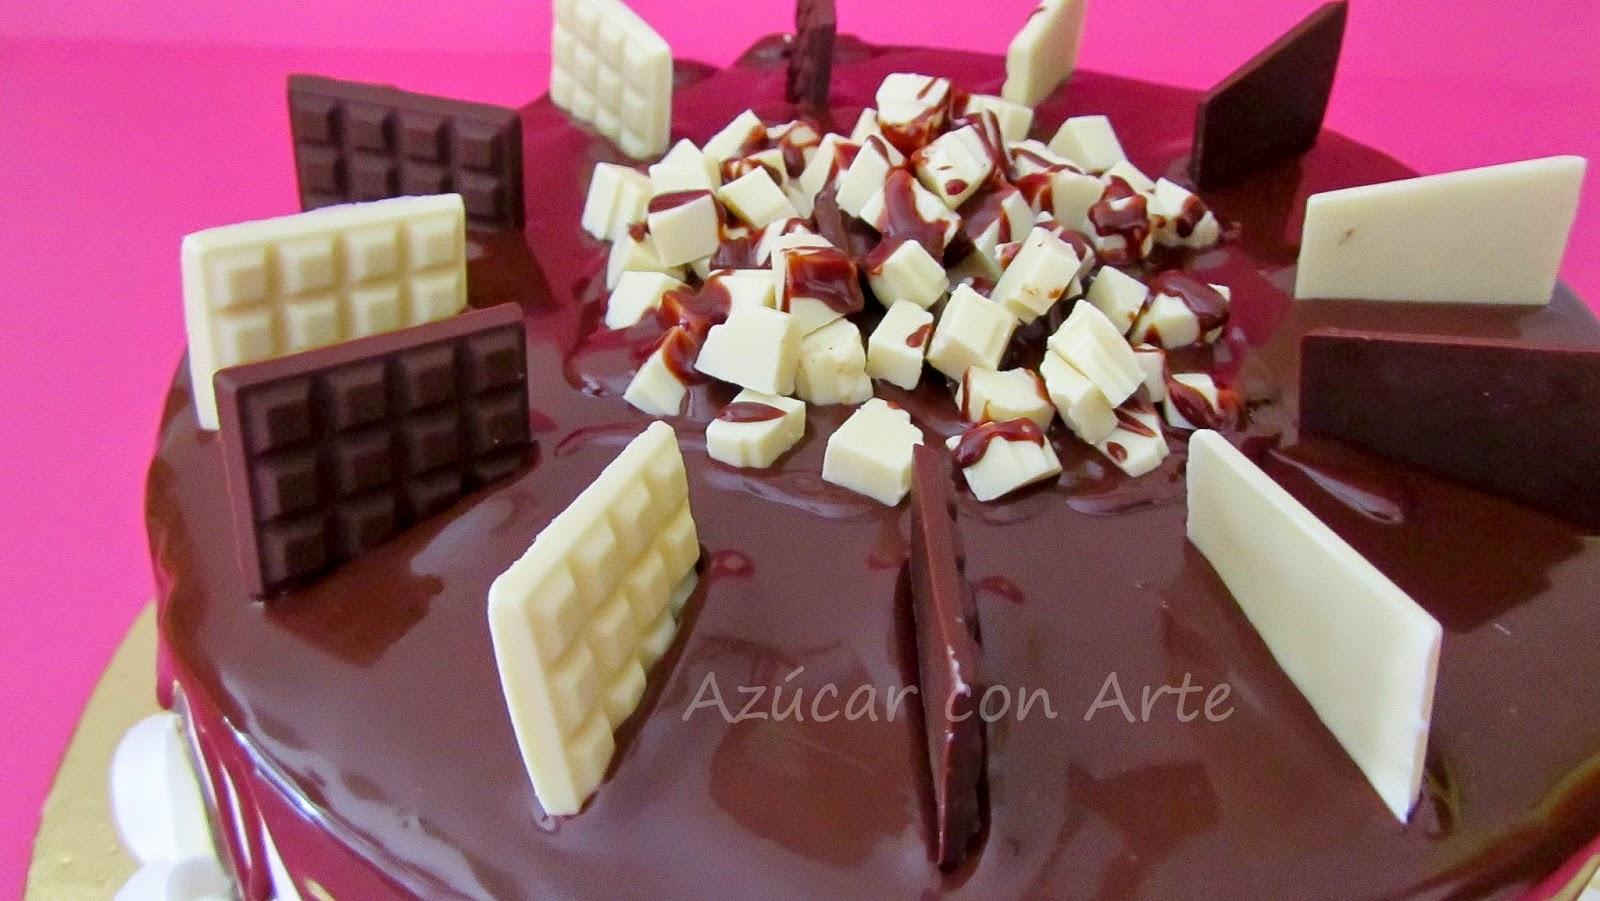 tarta de chocolate, tarta de nata chocolate cake, tarta sin gluten, gluten free cake azucar con arte